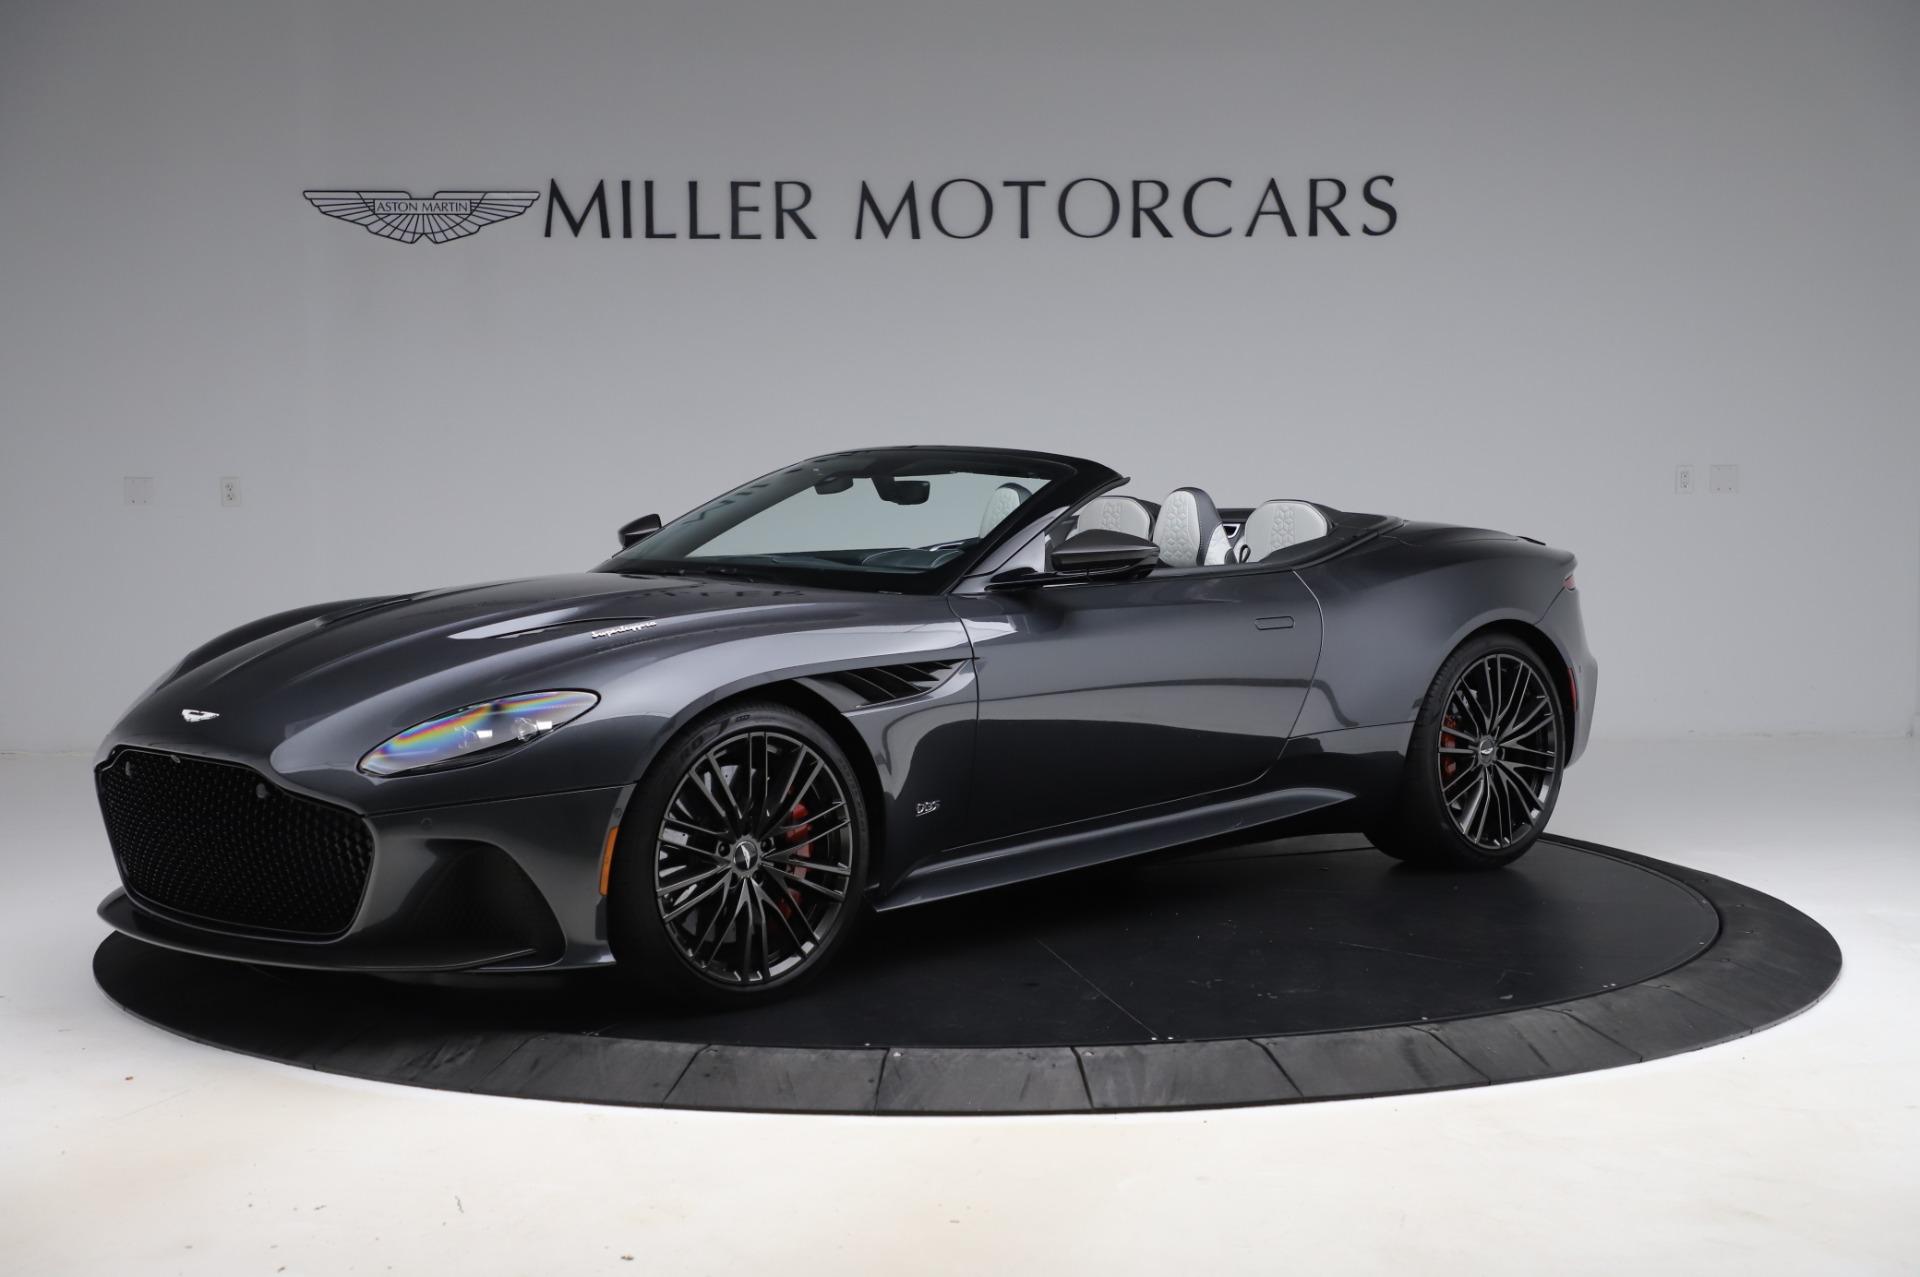 Used-2020-Aston-Martin-DBS-Superleggera-Volante